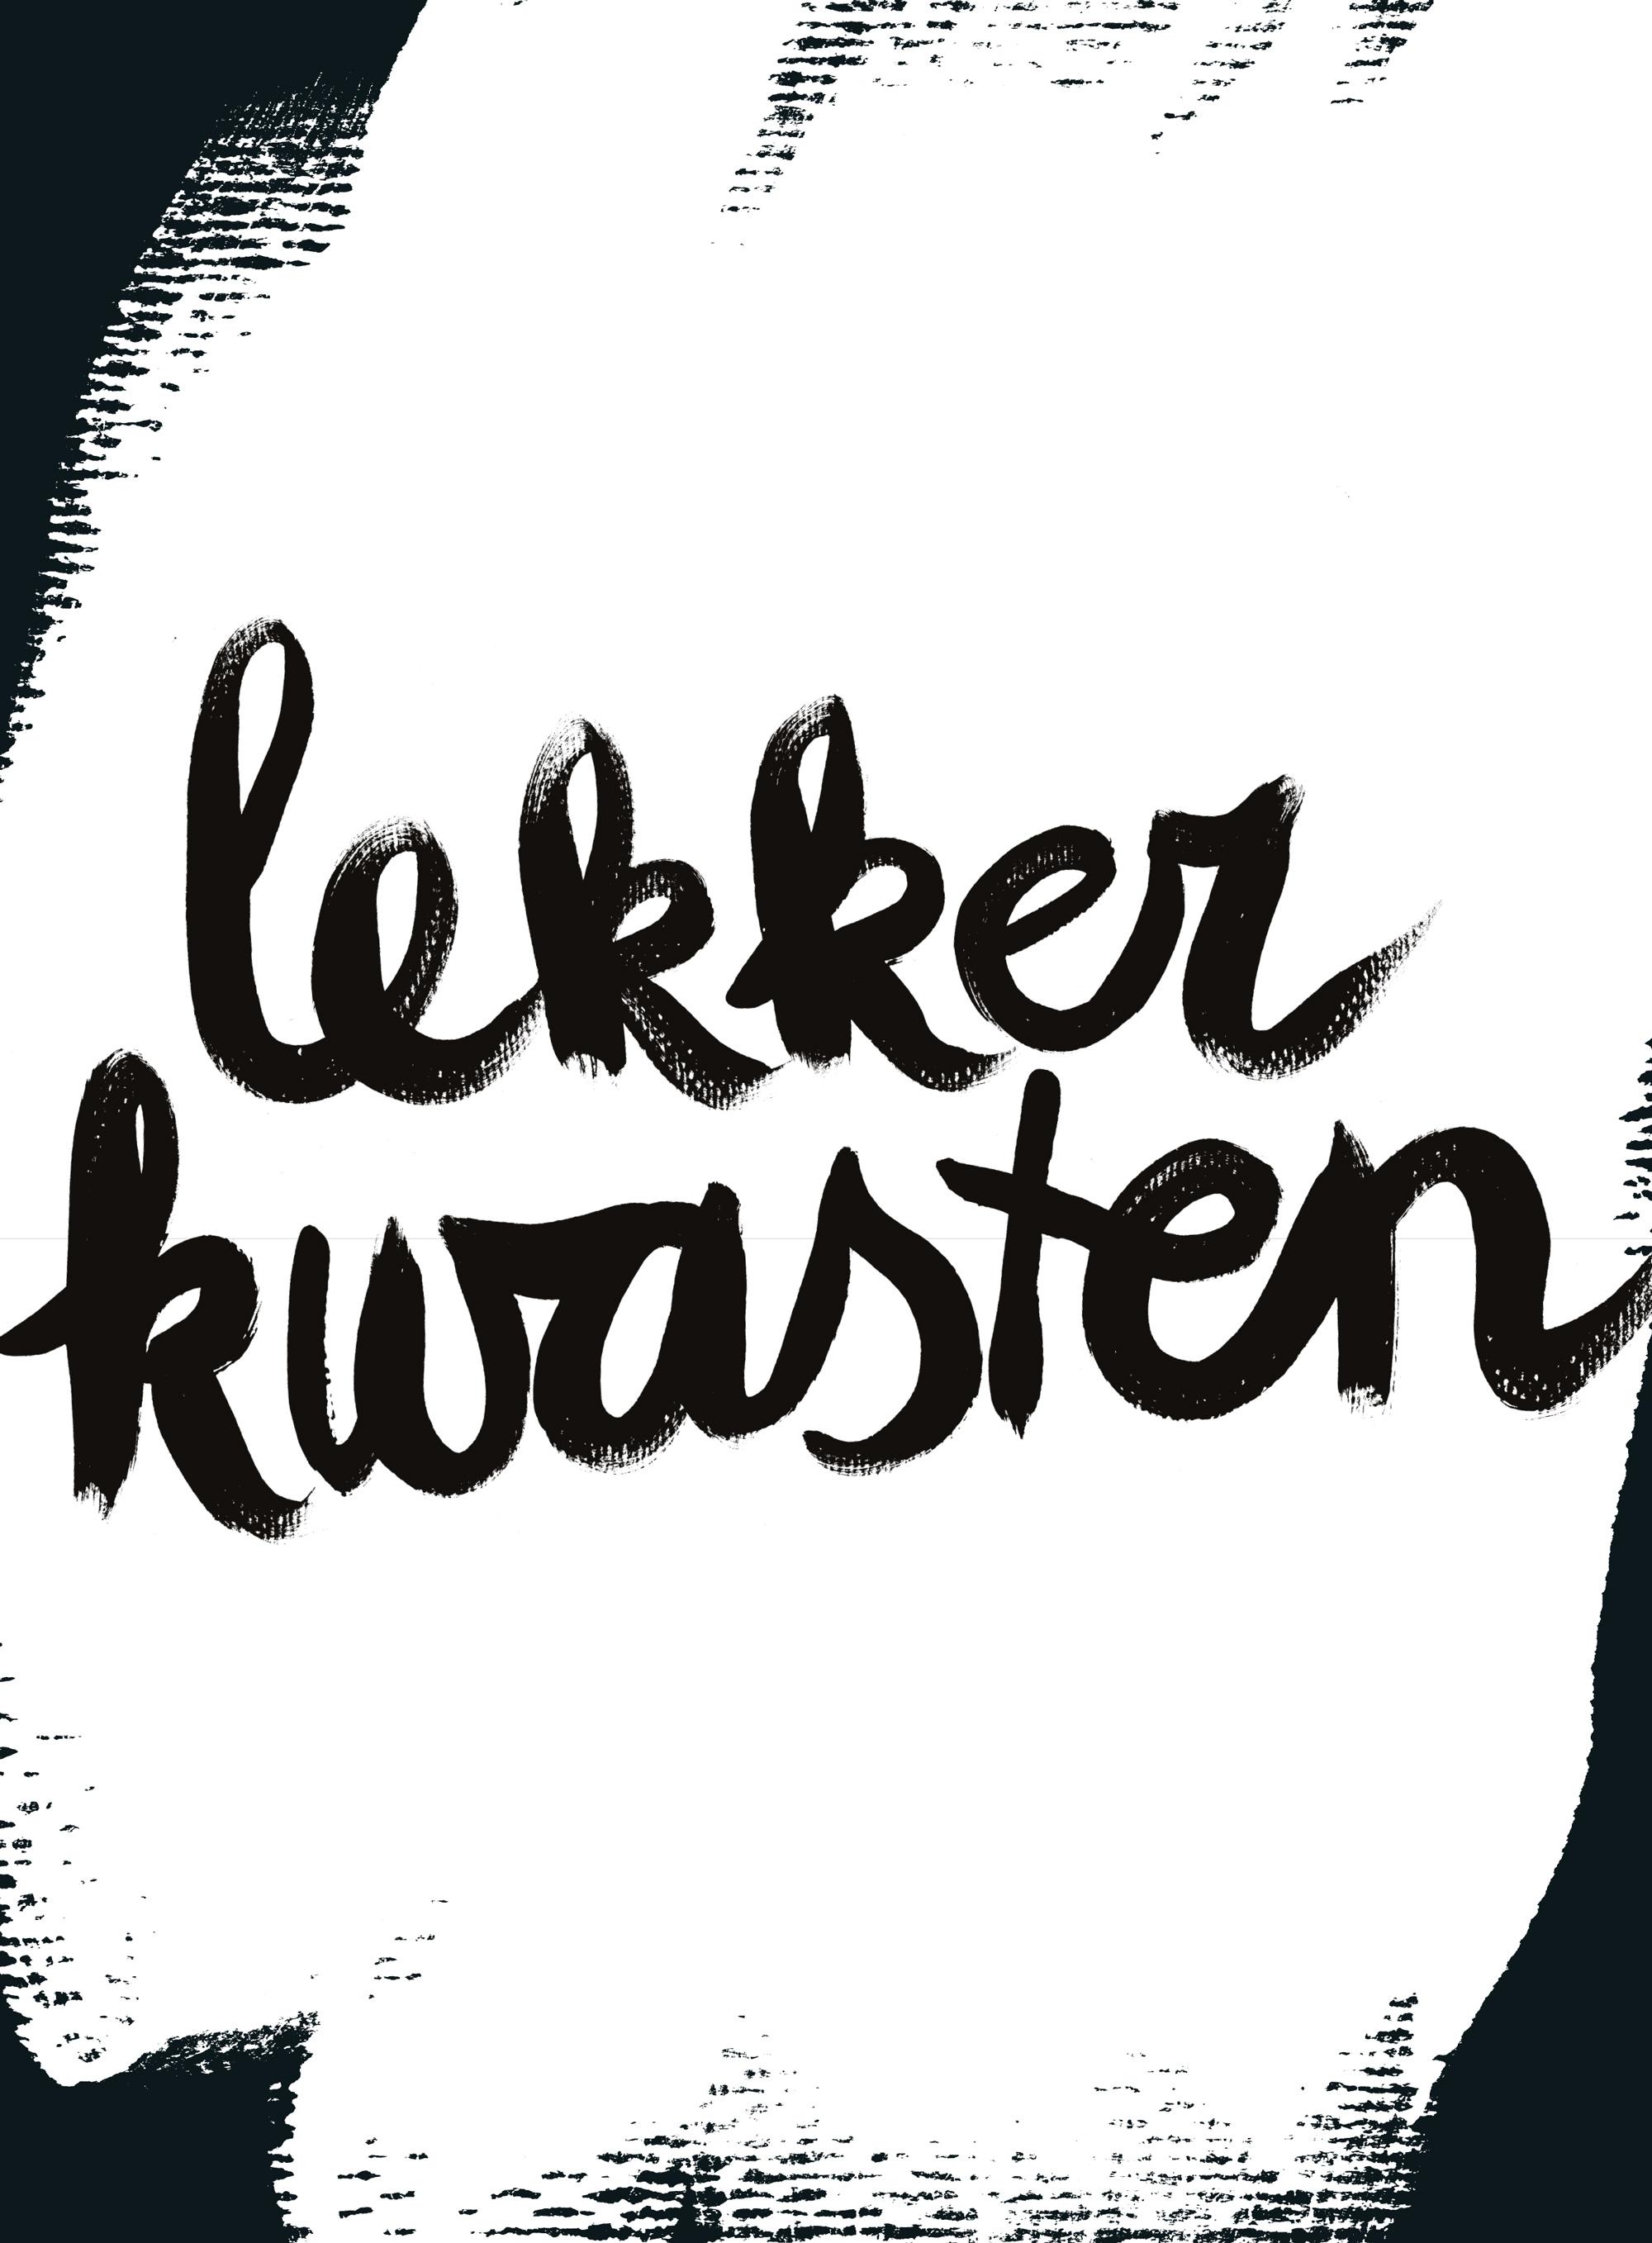 Happy-page-lekker-kwasten